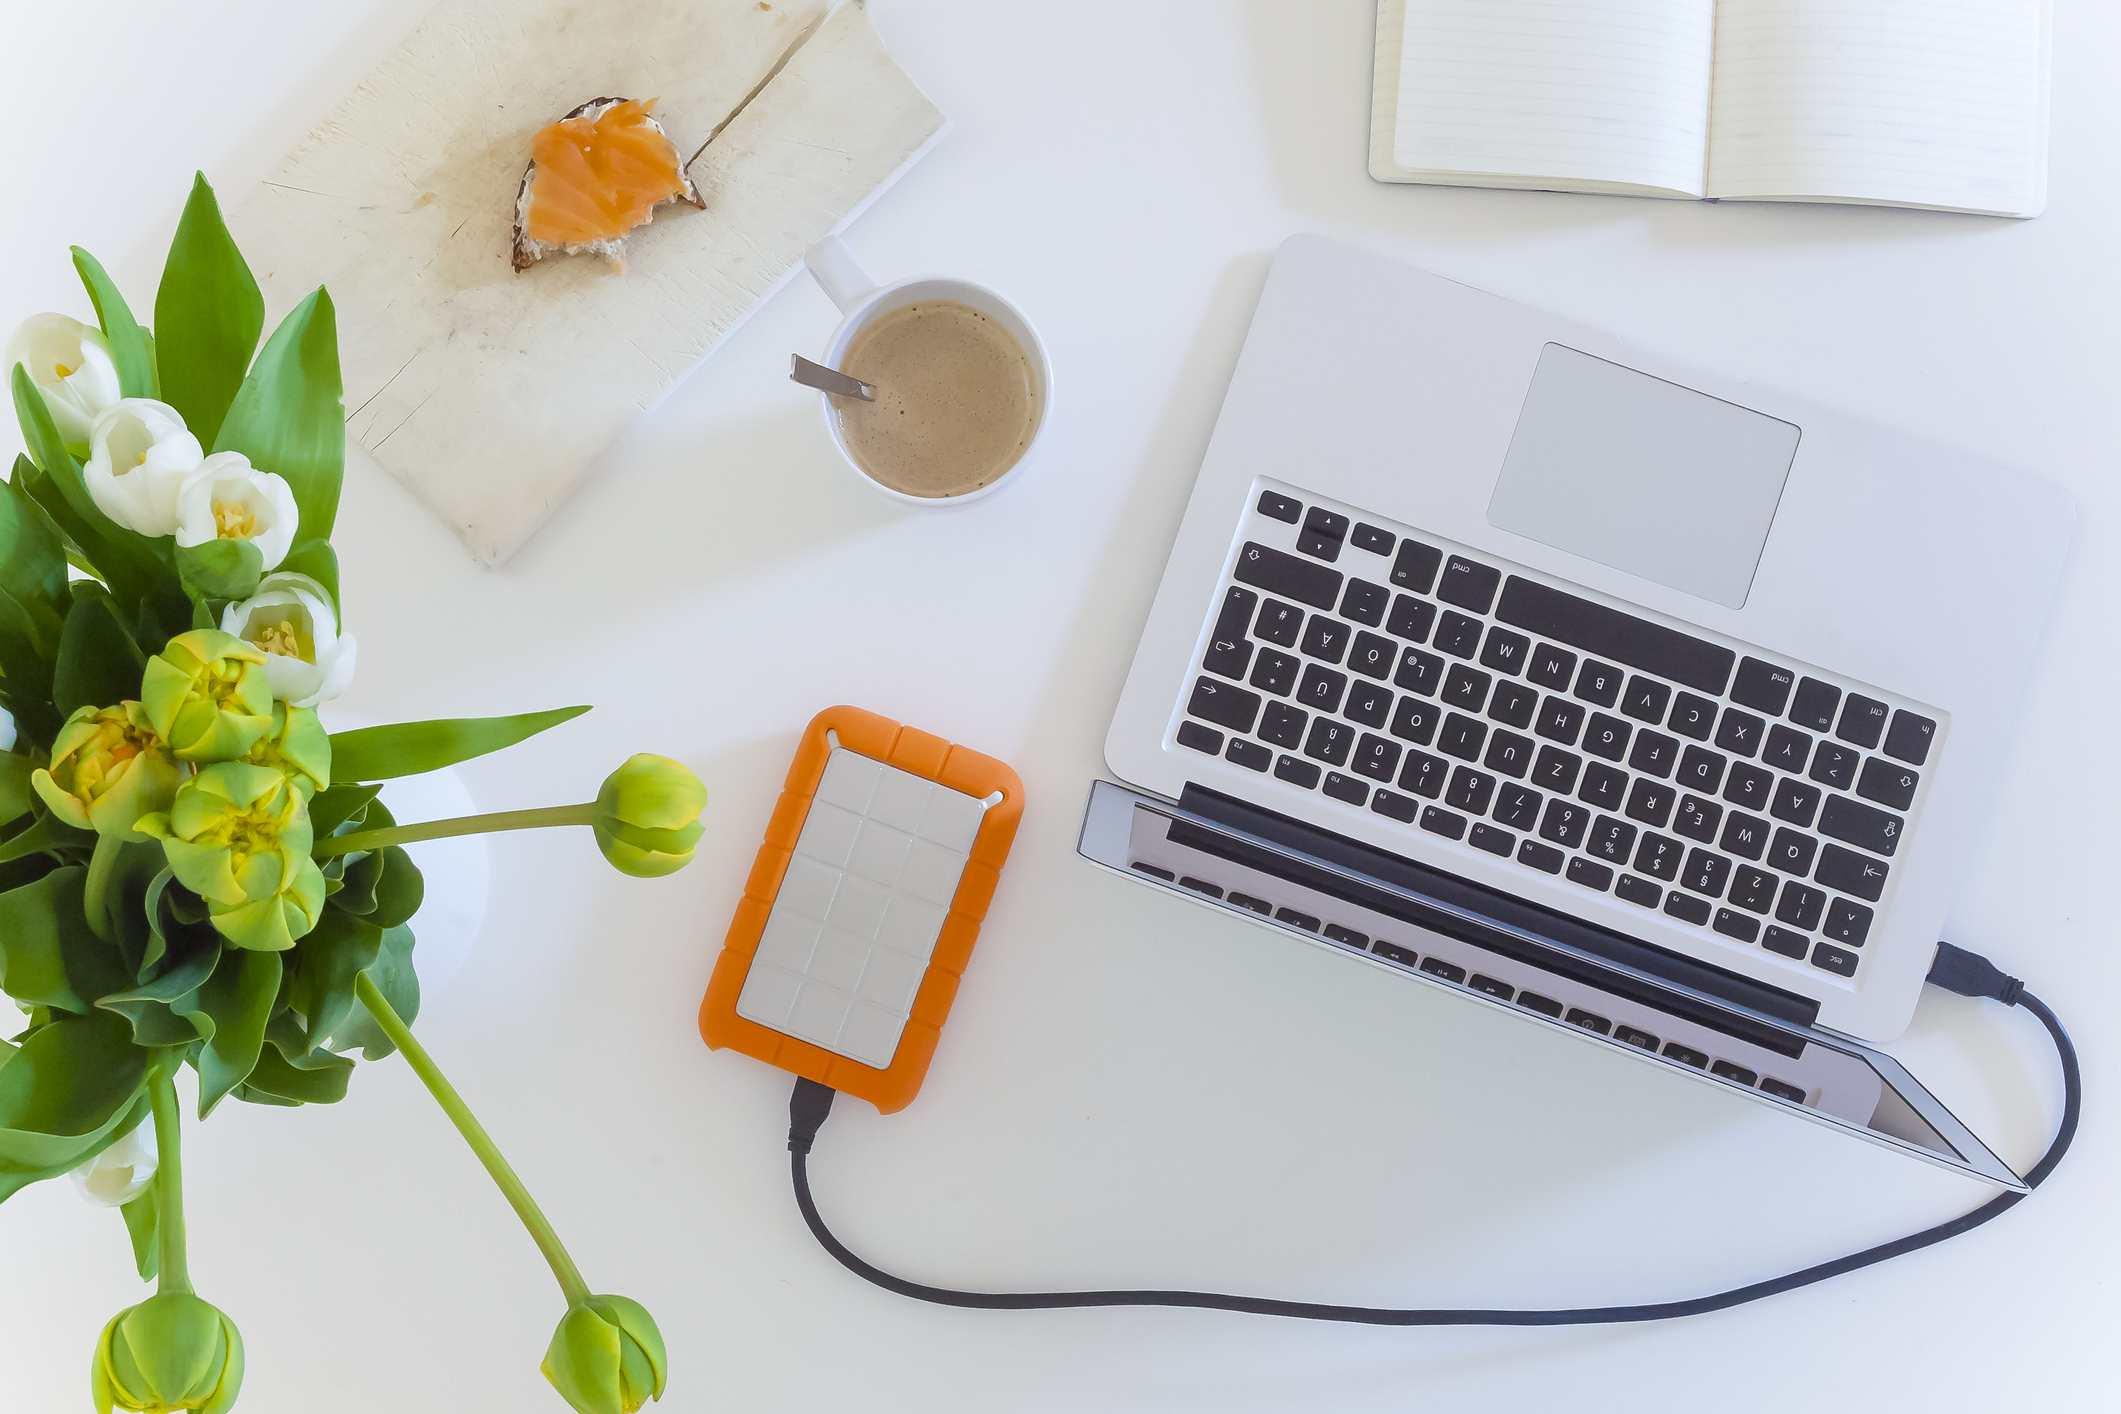 An external hard drive on a table.